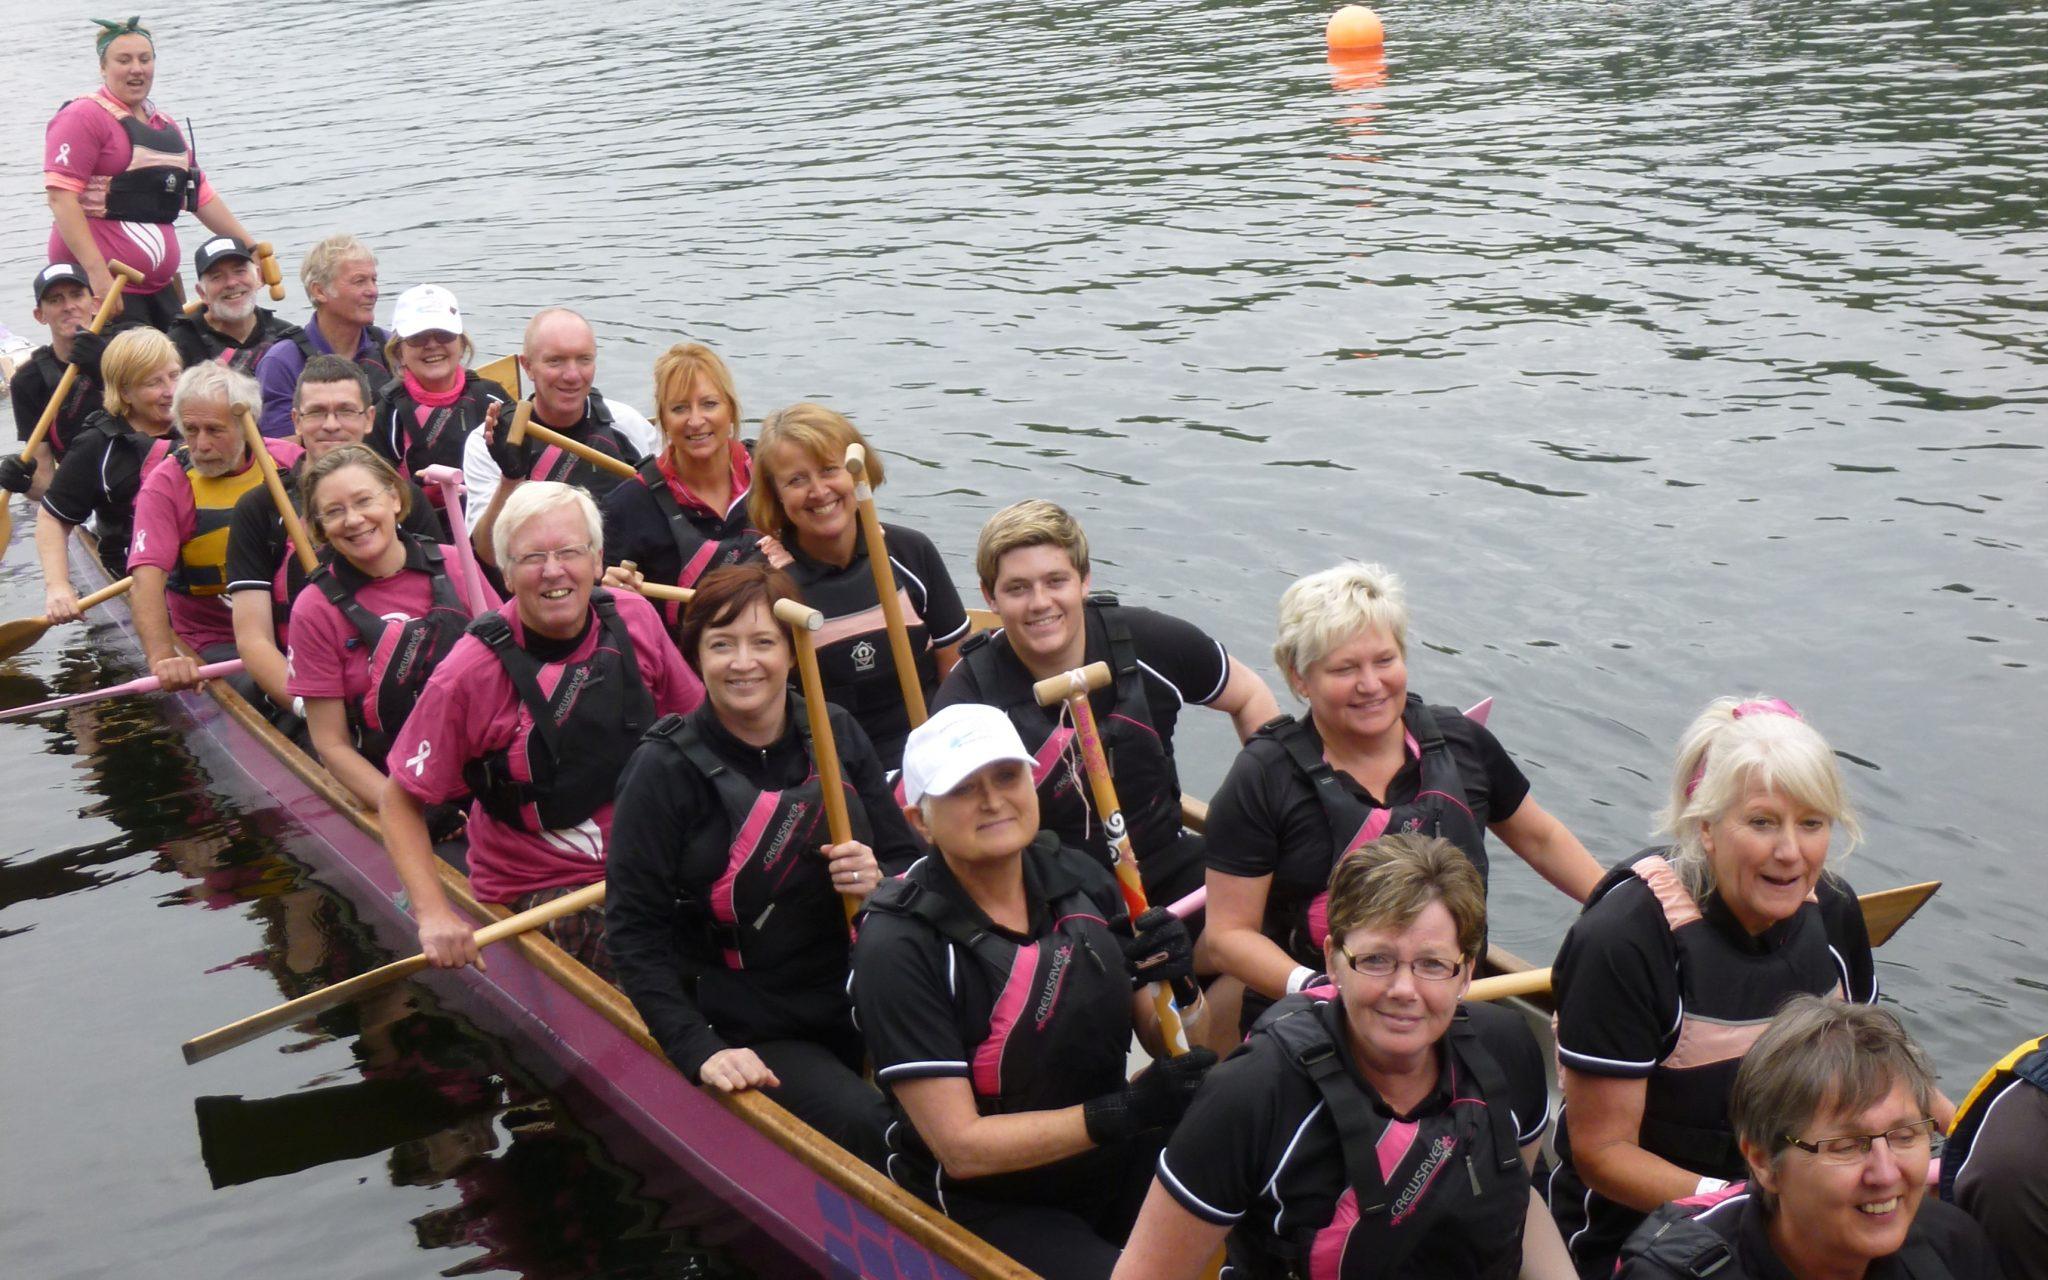 2014 Dragon Bay regatta crew.